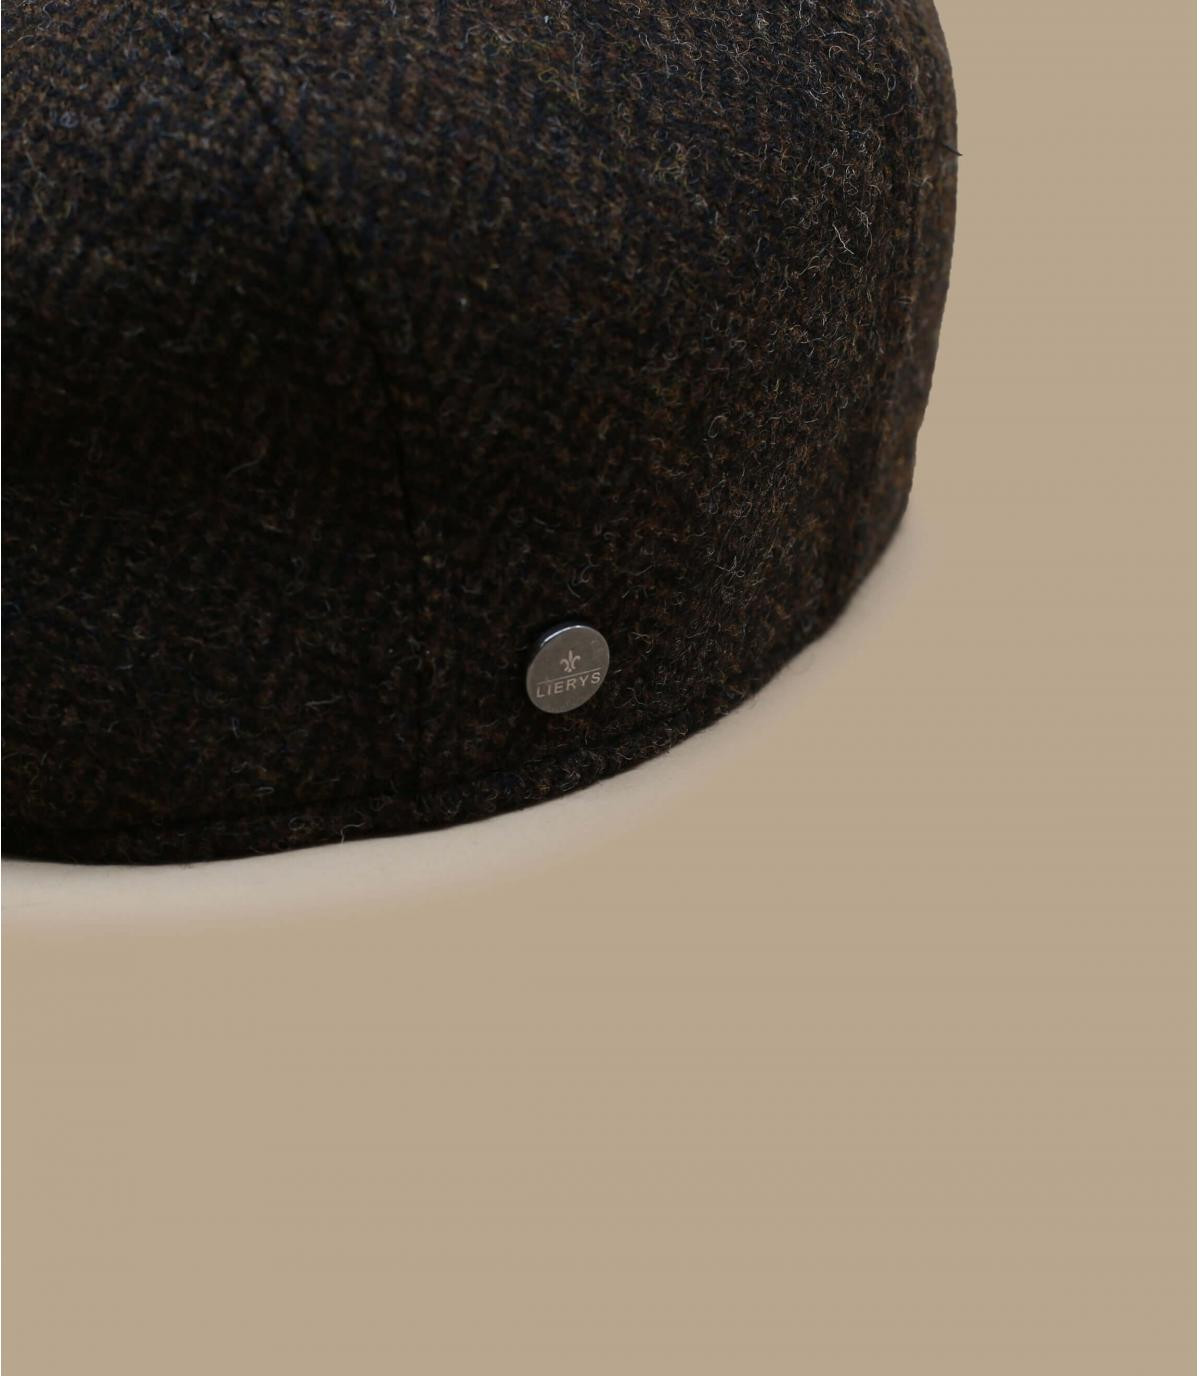 Details Britton Wool Herringbone brown - Abbildung 2